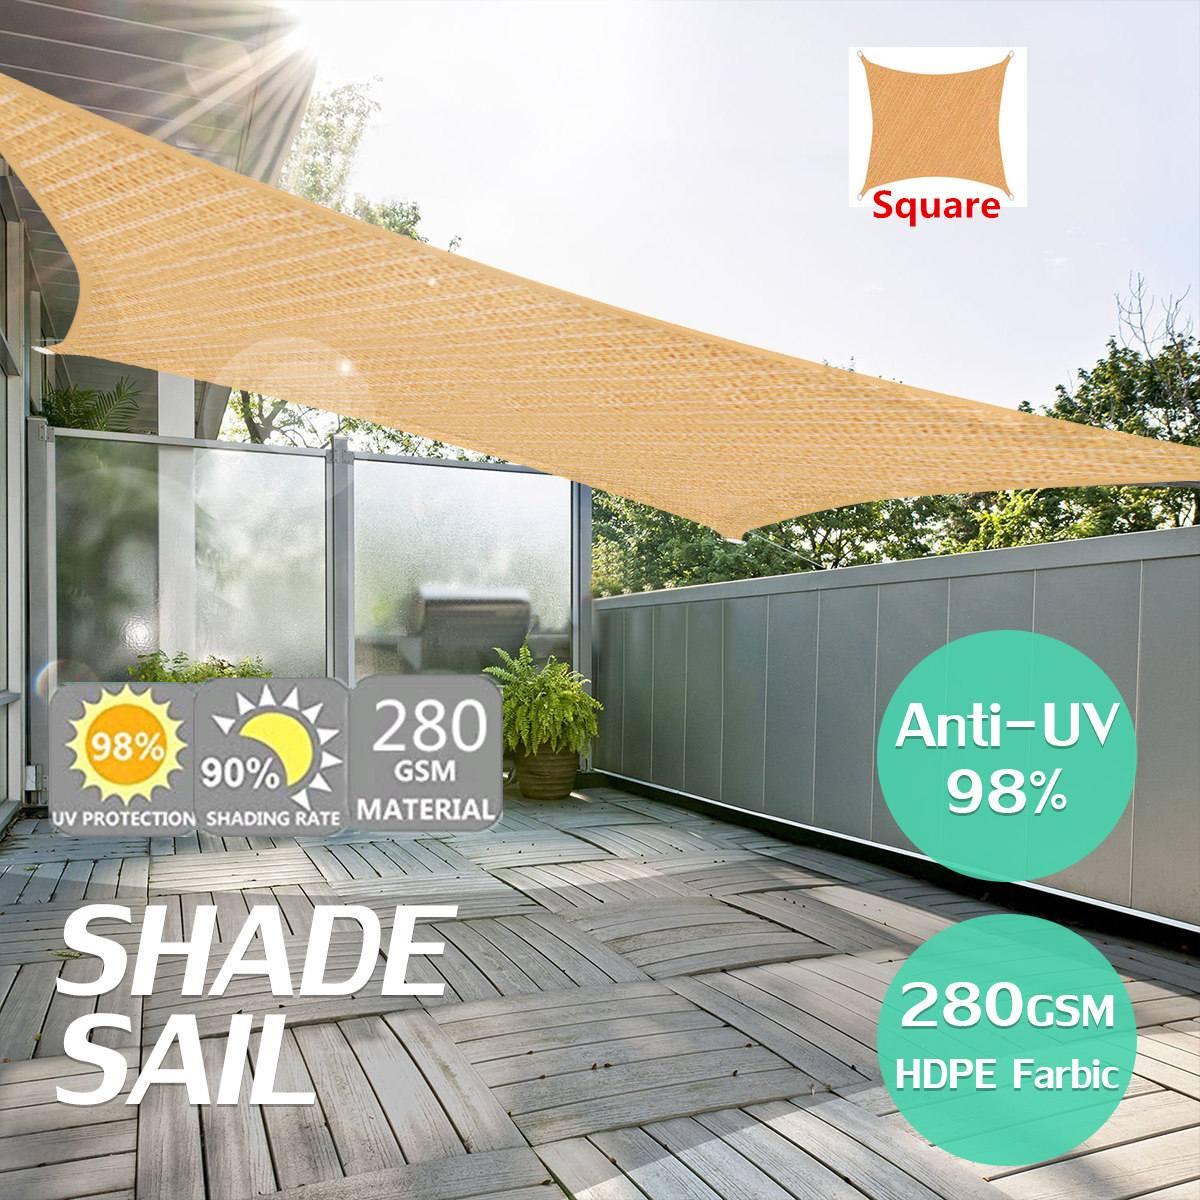 Parasol Protector de Malla Transpirable de protecci/ón contra el Sol con Polietileno M X Pa/ño de Sombra tama/ño 19 Tama/ño : 2x1m